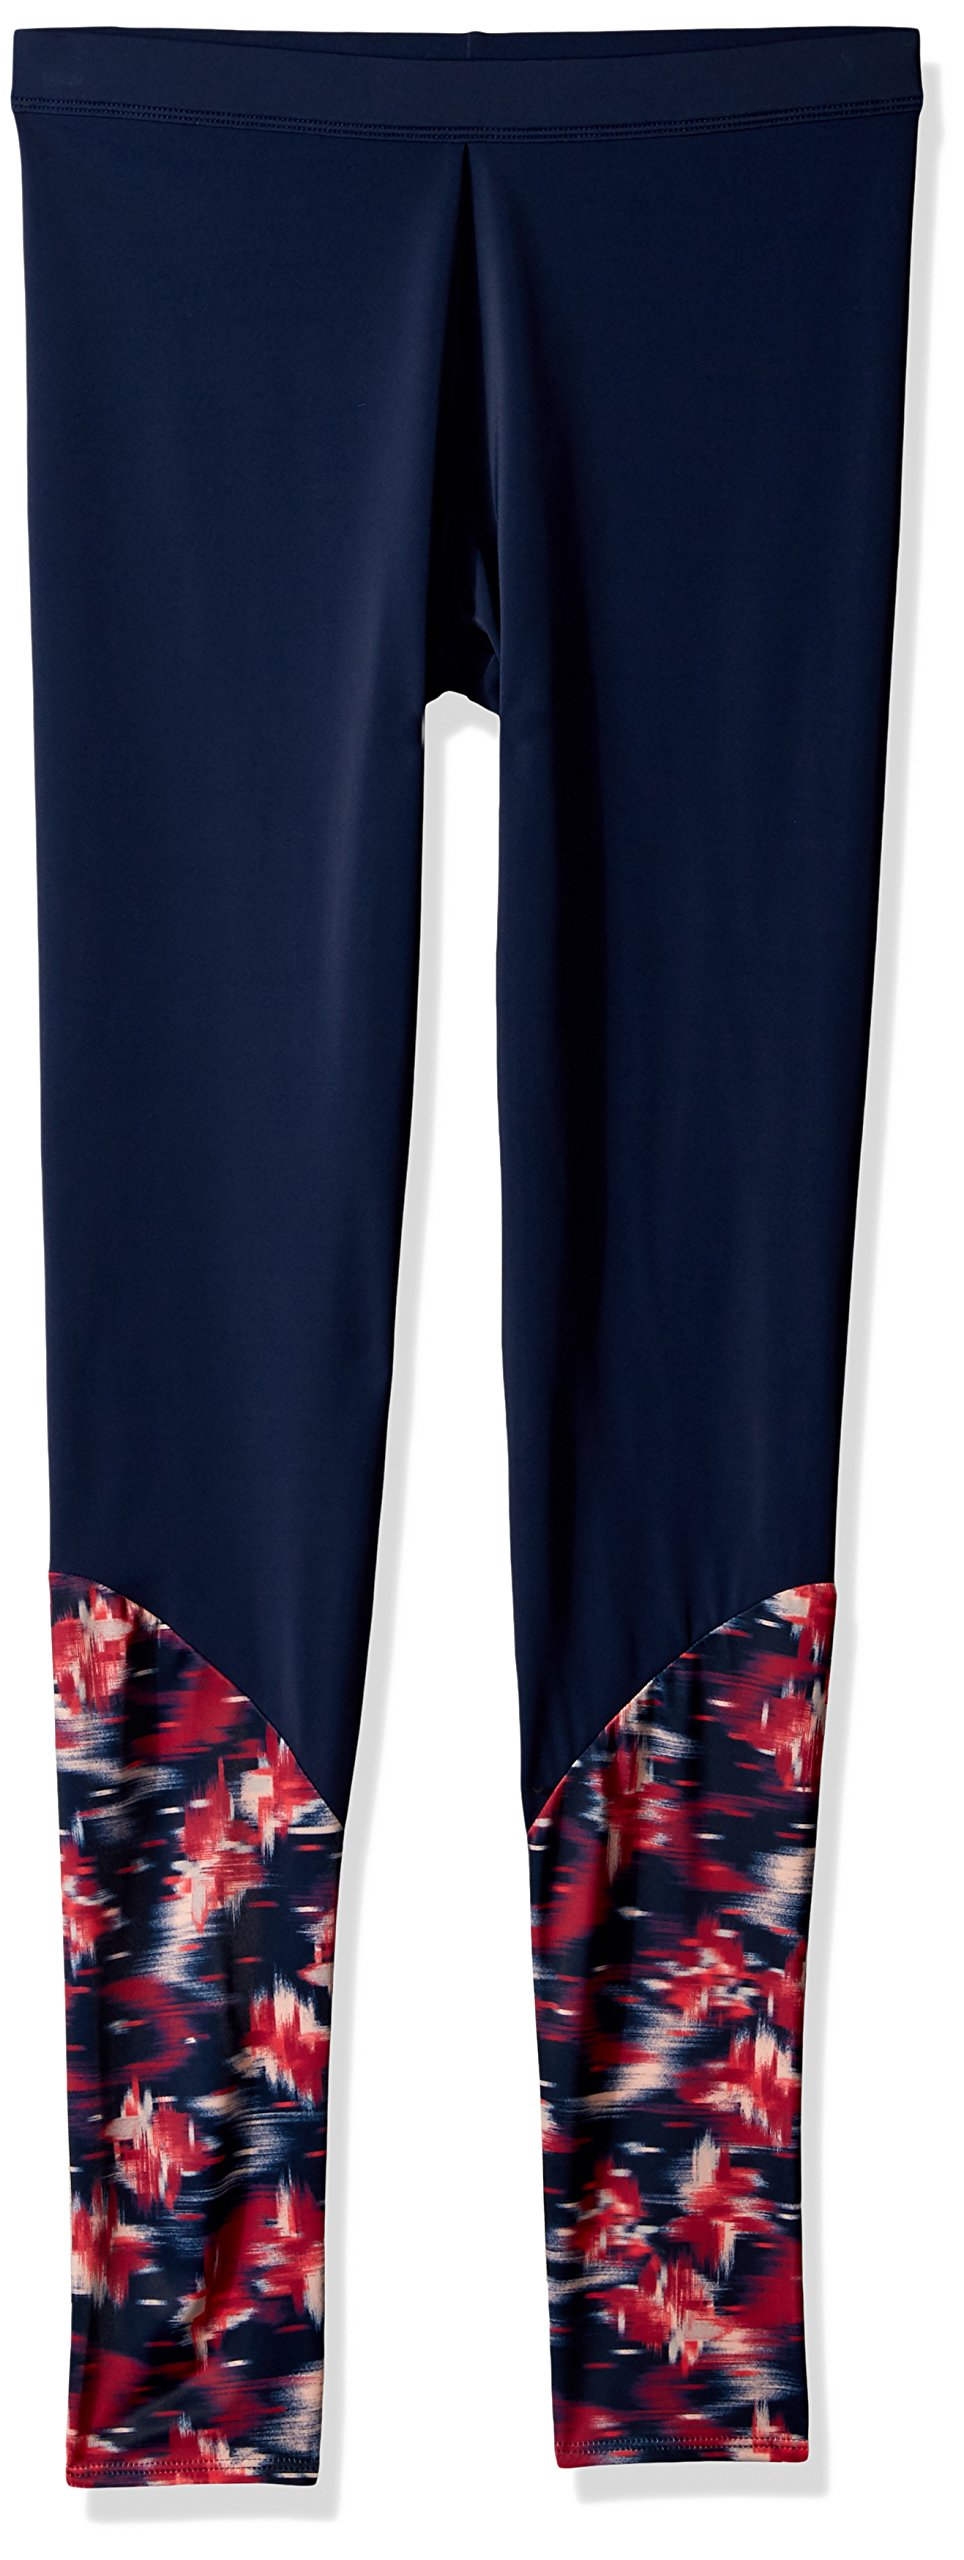 Roxy Big Girls' Sporty Legging, Dress Blues Neon Waterfall, 10/M